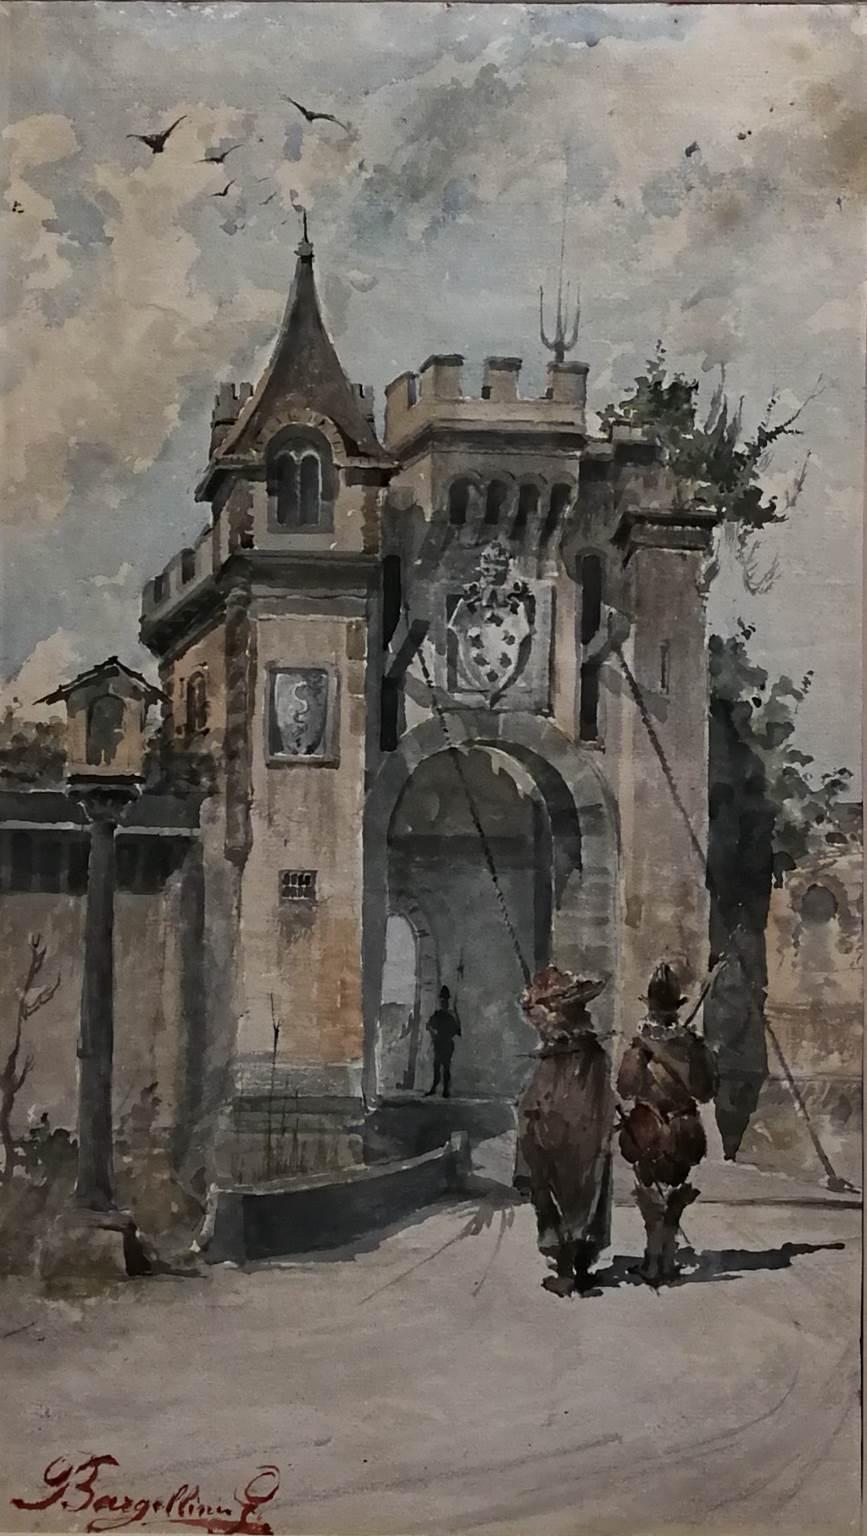 Signed G Bargellini Landscape Figurative Watercolors Drawing 1890 circa